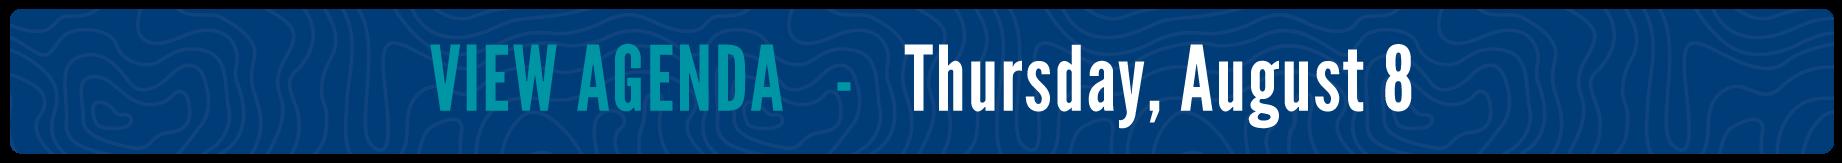 View Agenda - Thursday, August 8